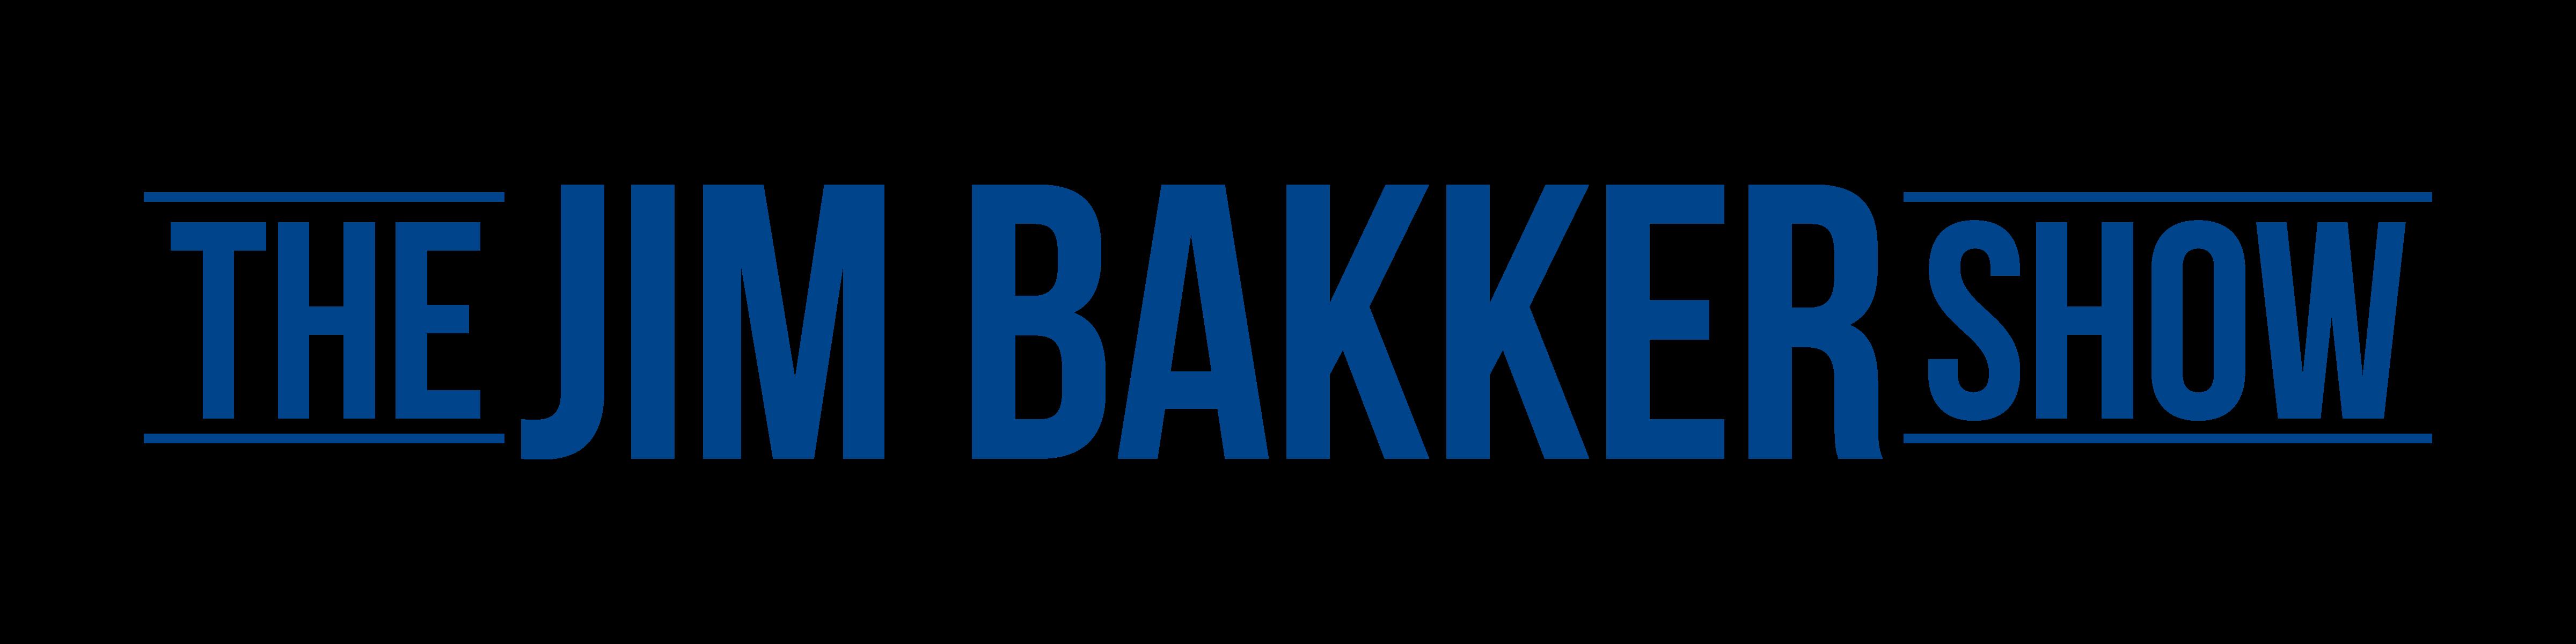 The Jim Bakker Show Podcast on The PTL Network